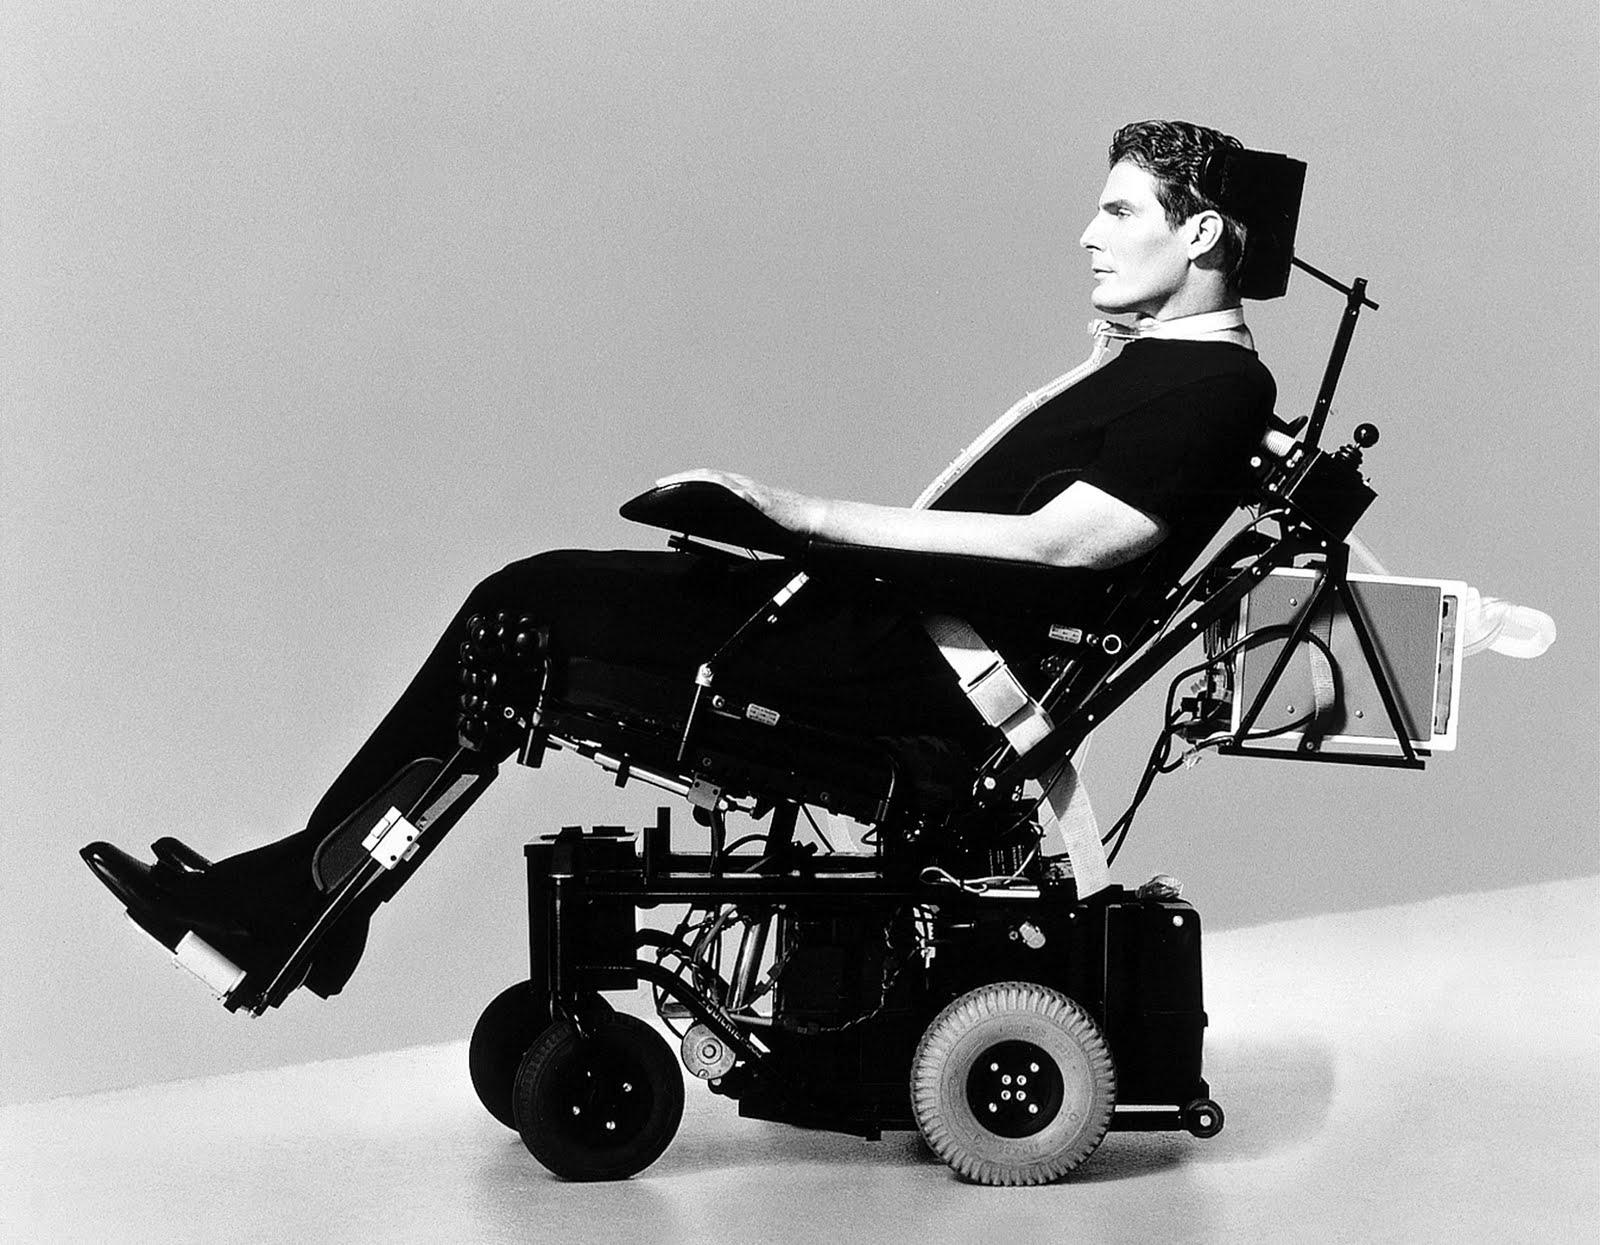 Christopher Reeve Widescreen for desktop